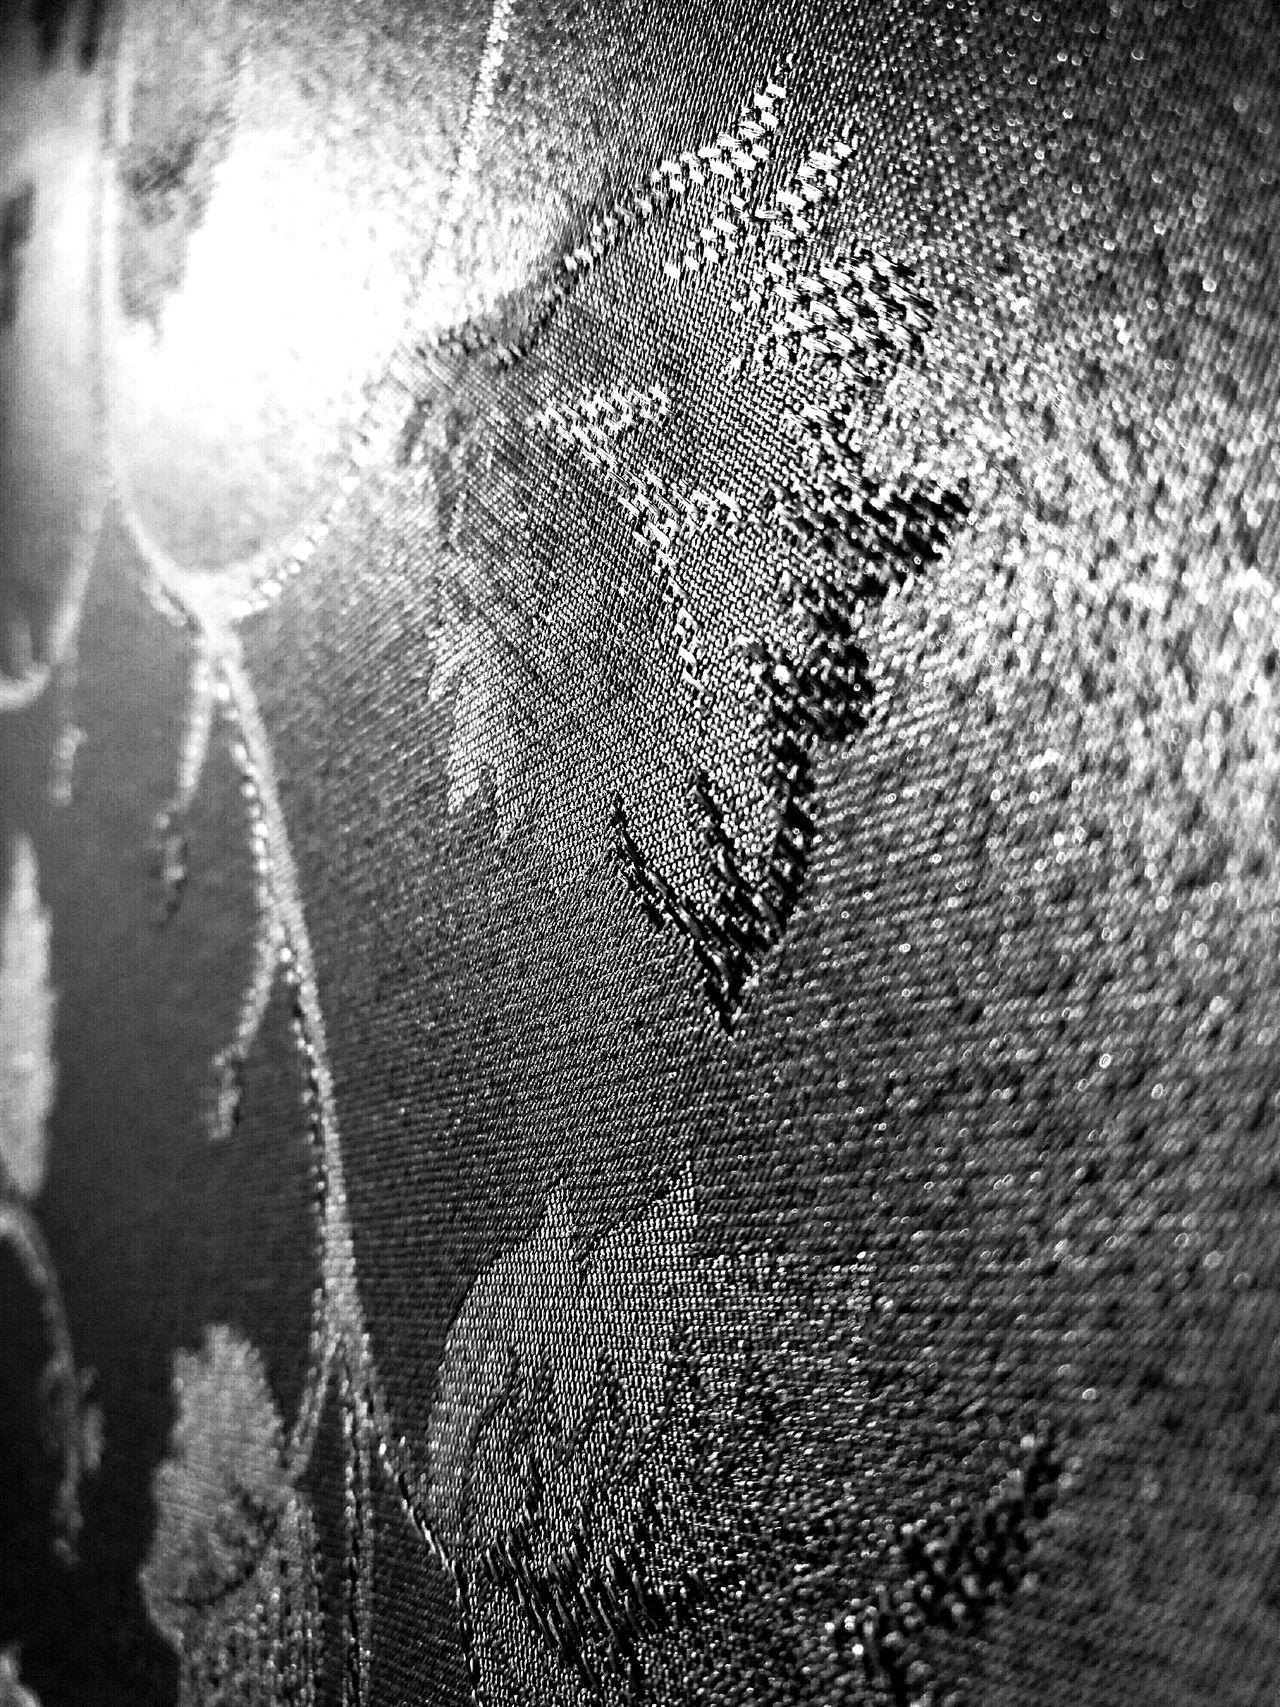 Maximum Closeness Backgrounds Wall Textures Walltapestry Monochrome